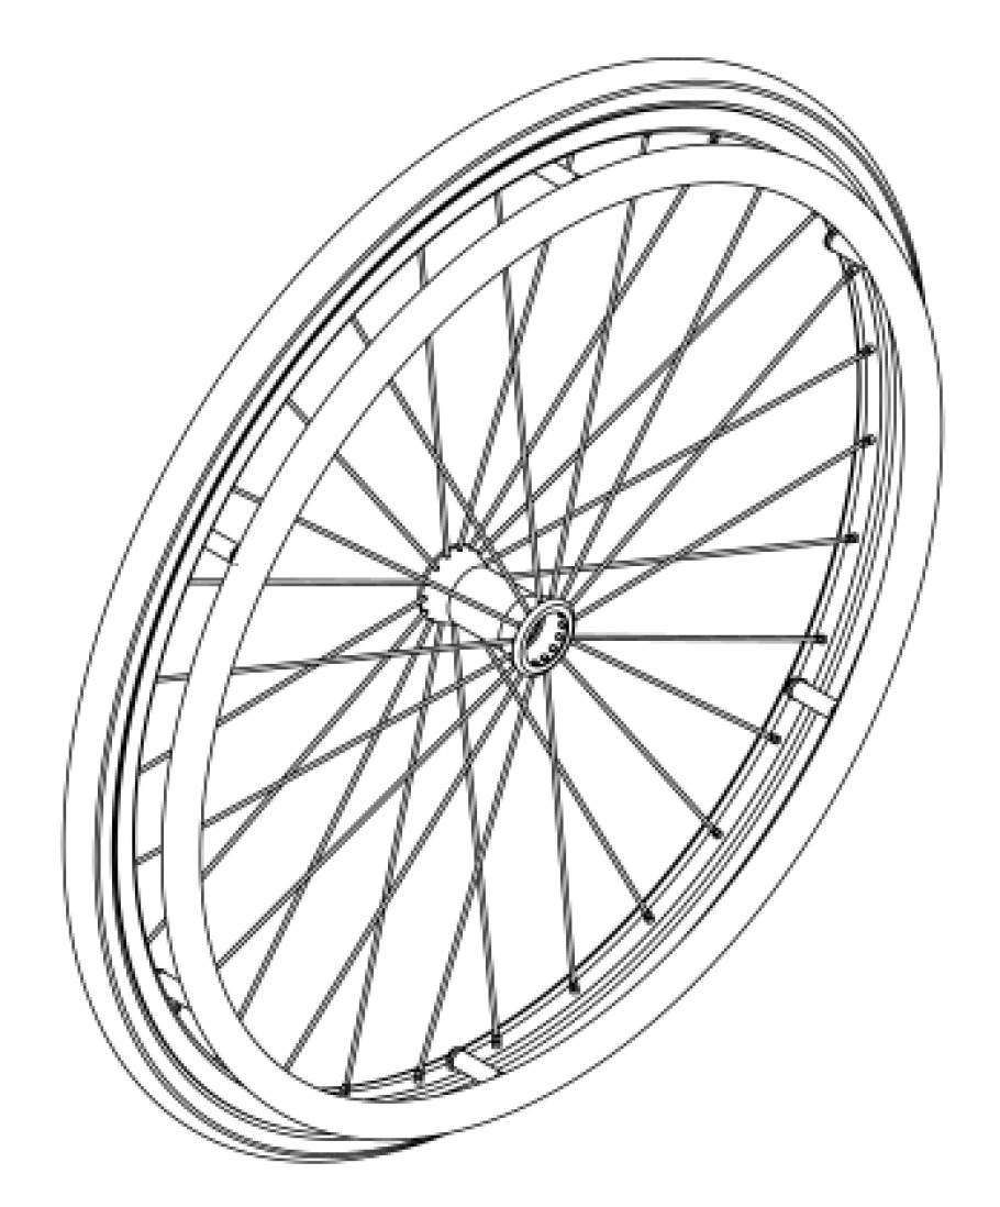 (discontinued) Rigid Spoke Wheel / Tire / Handrim Kits parts diagram